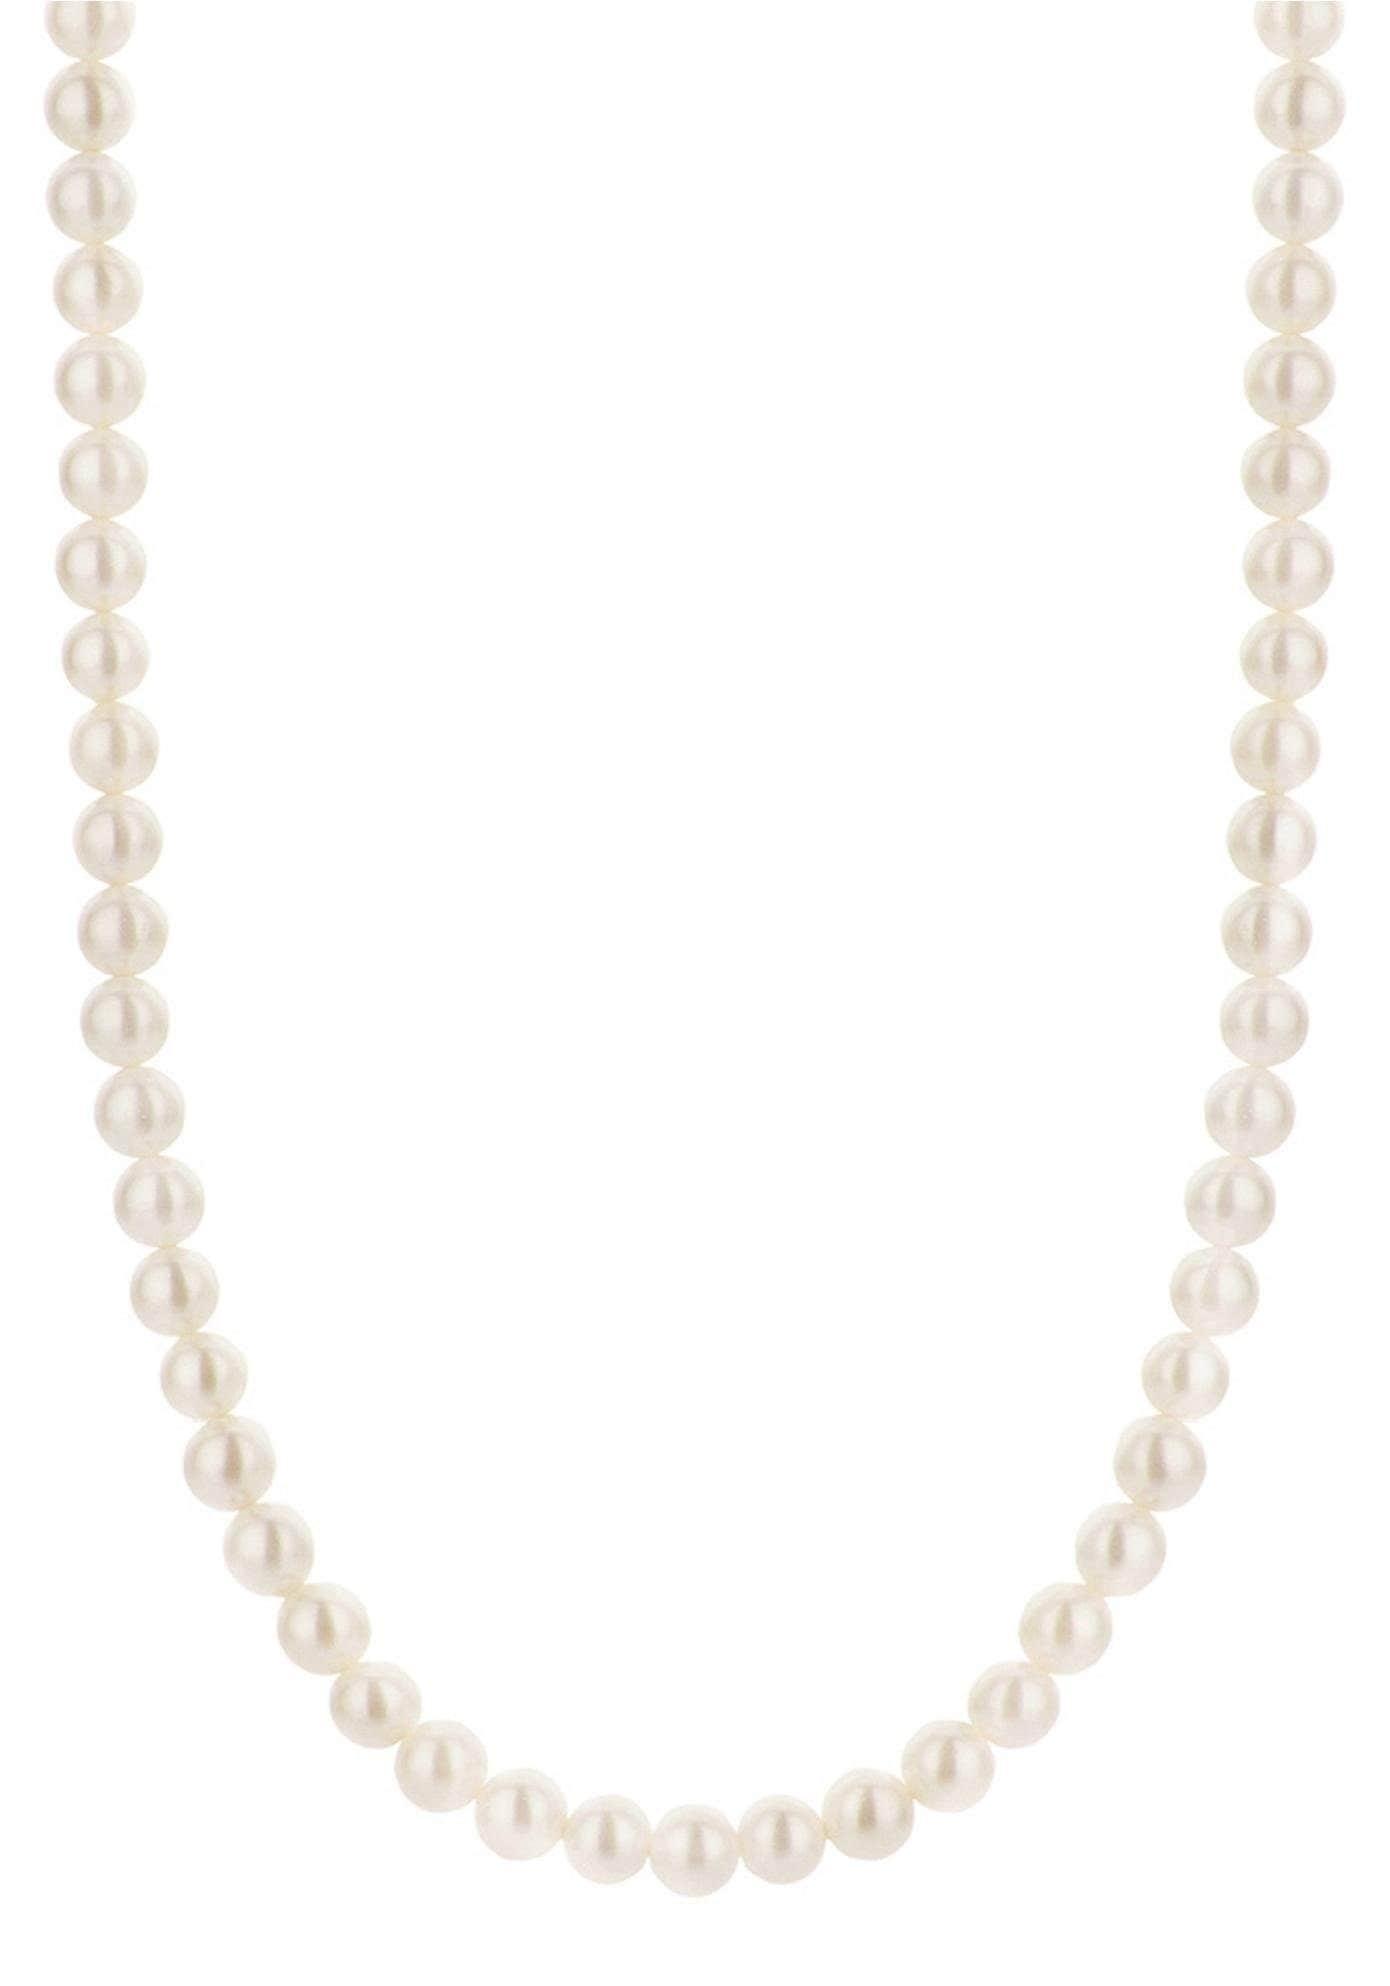 TI SENTO - Milano Perlenkette 3849PW/42 | Schmuck > Halsketten > Perlenketten | Ti Sento - Milano